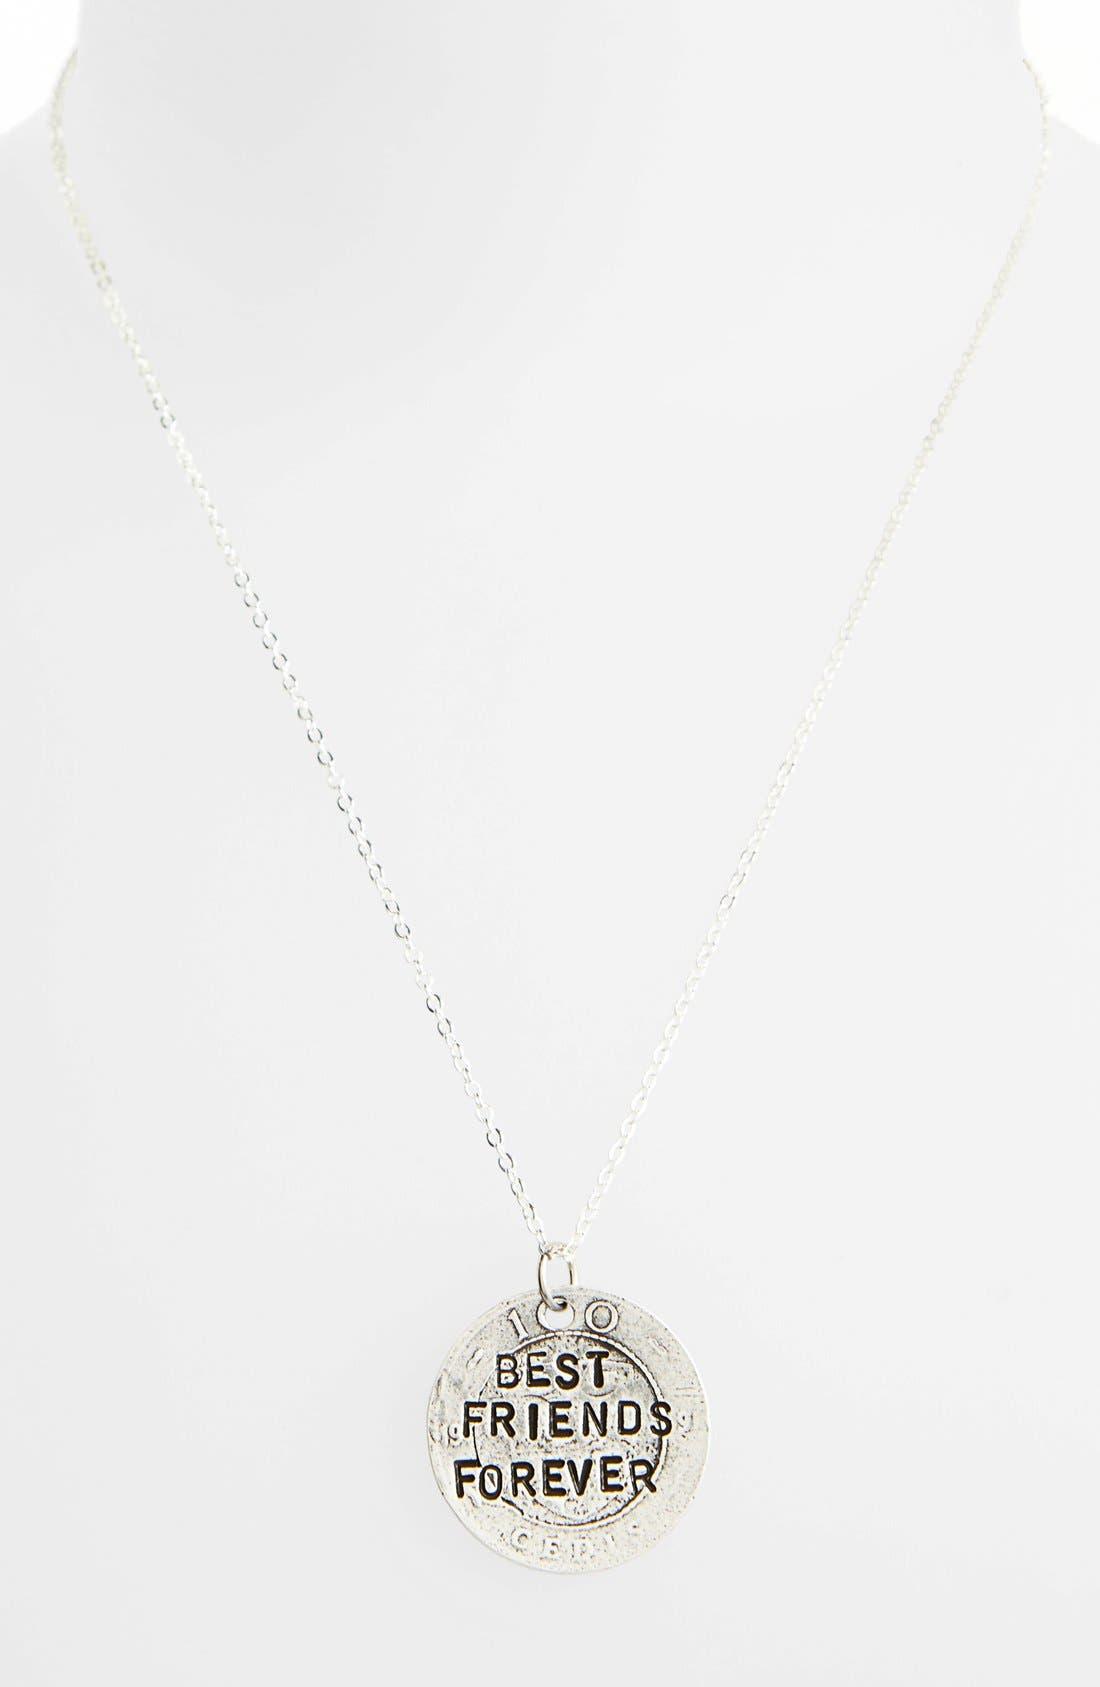 Main Image - Alisa Michelle Designs 'Best Friends Forever' Pendant Necklace